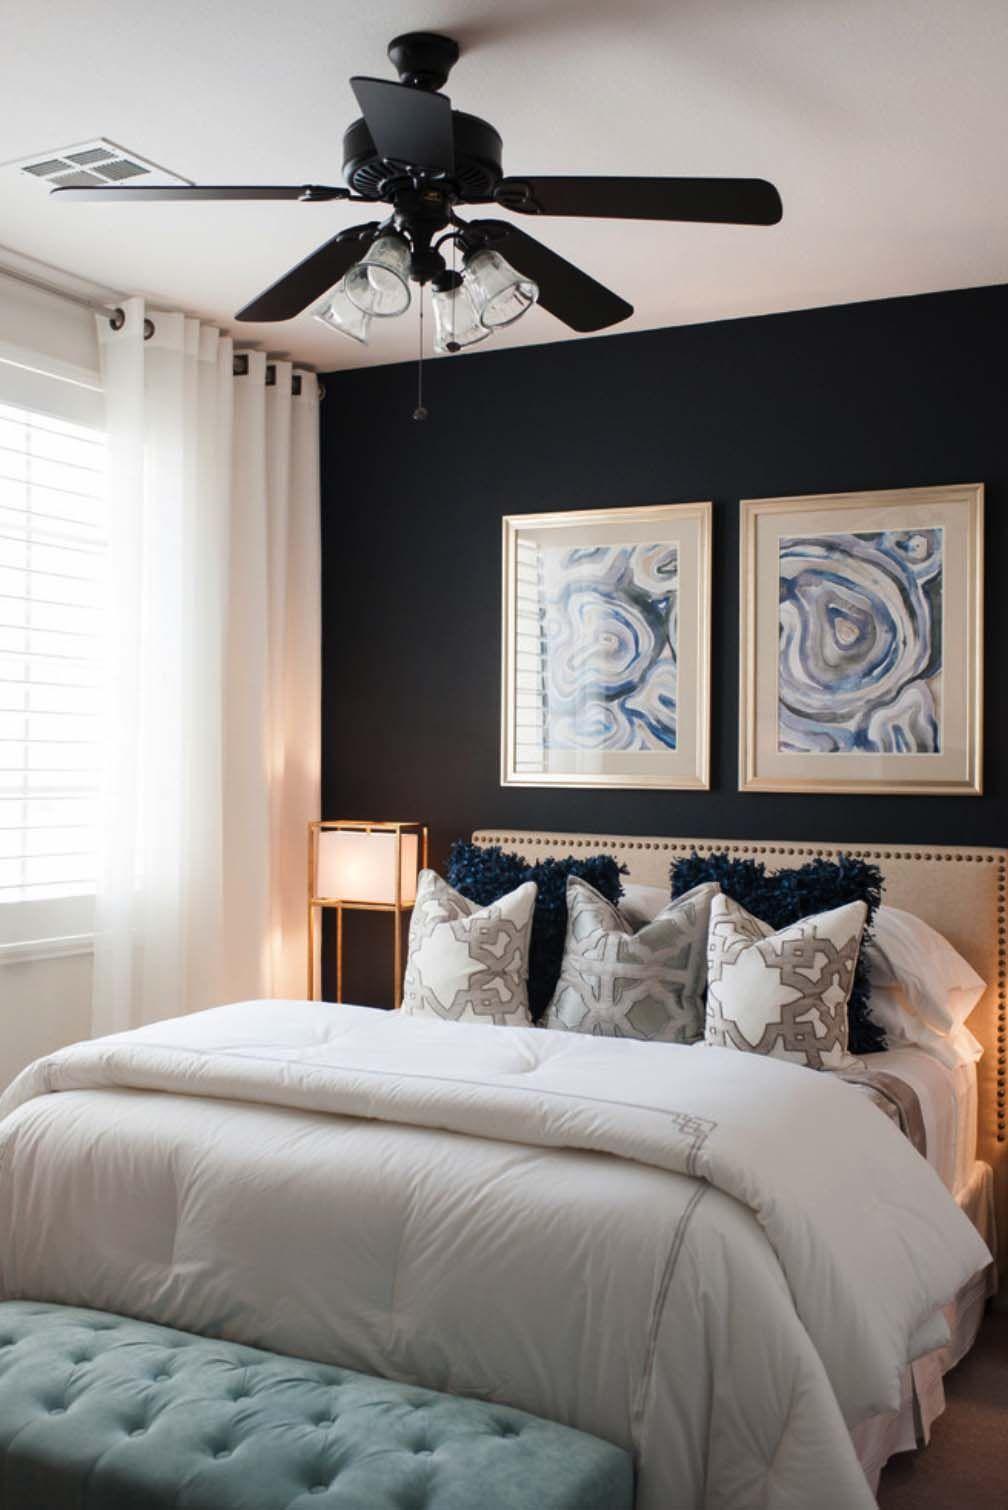 Small Master Bedroom Ideas 11 1 Kindesign 30 Small